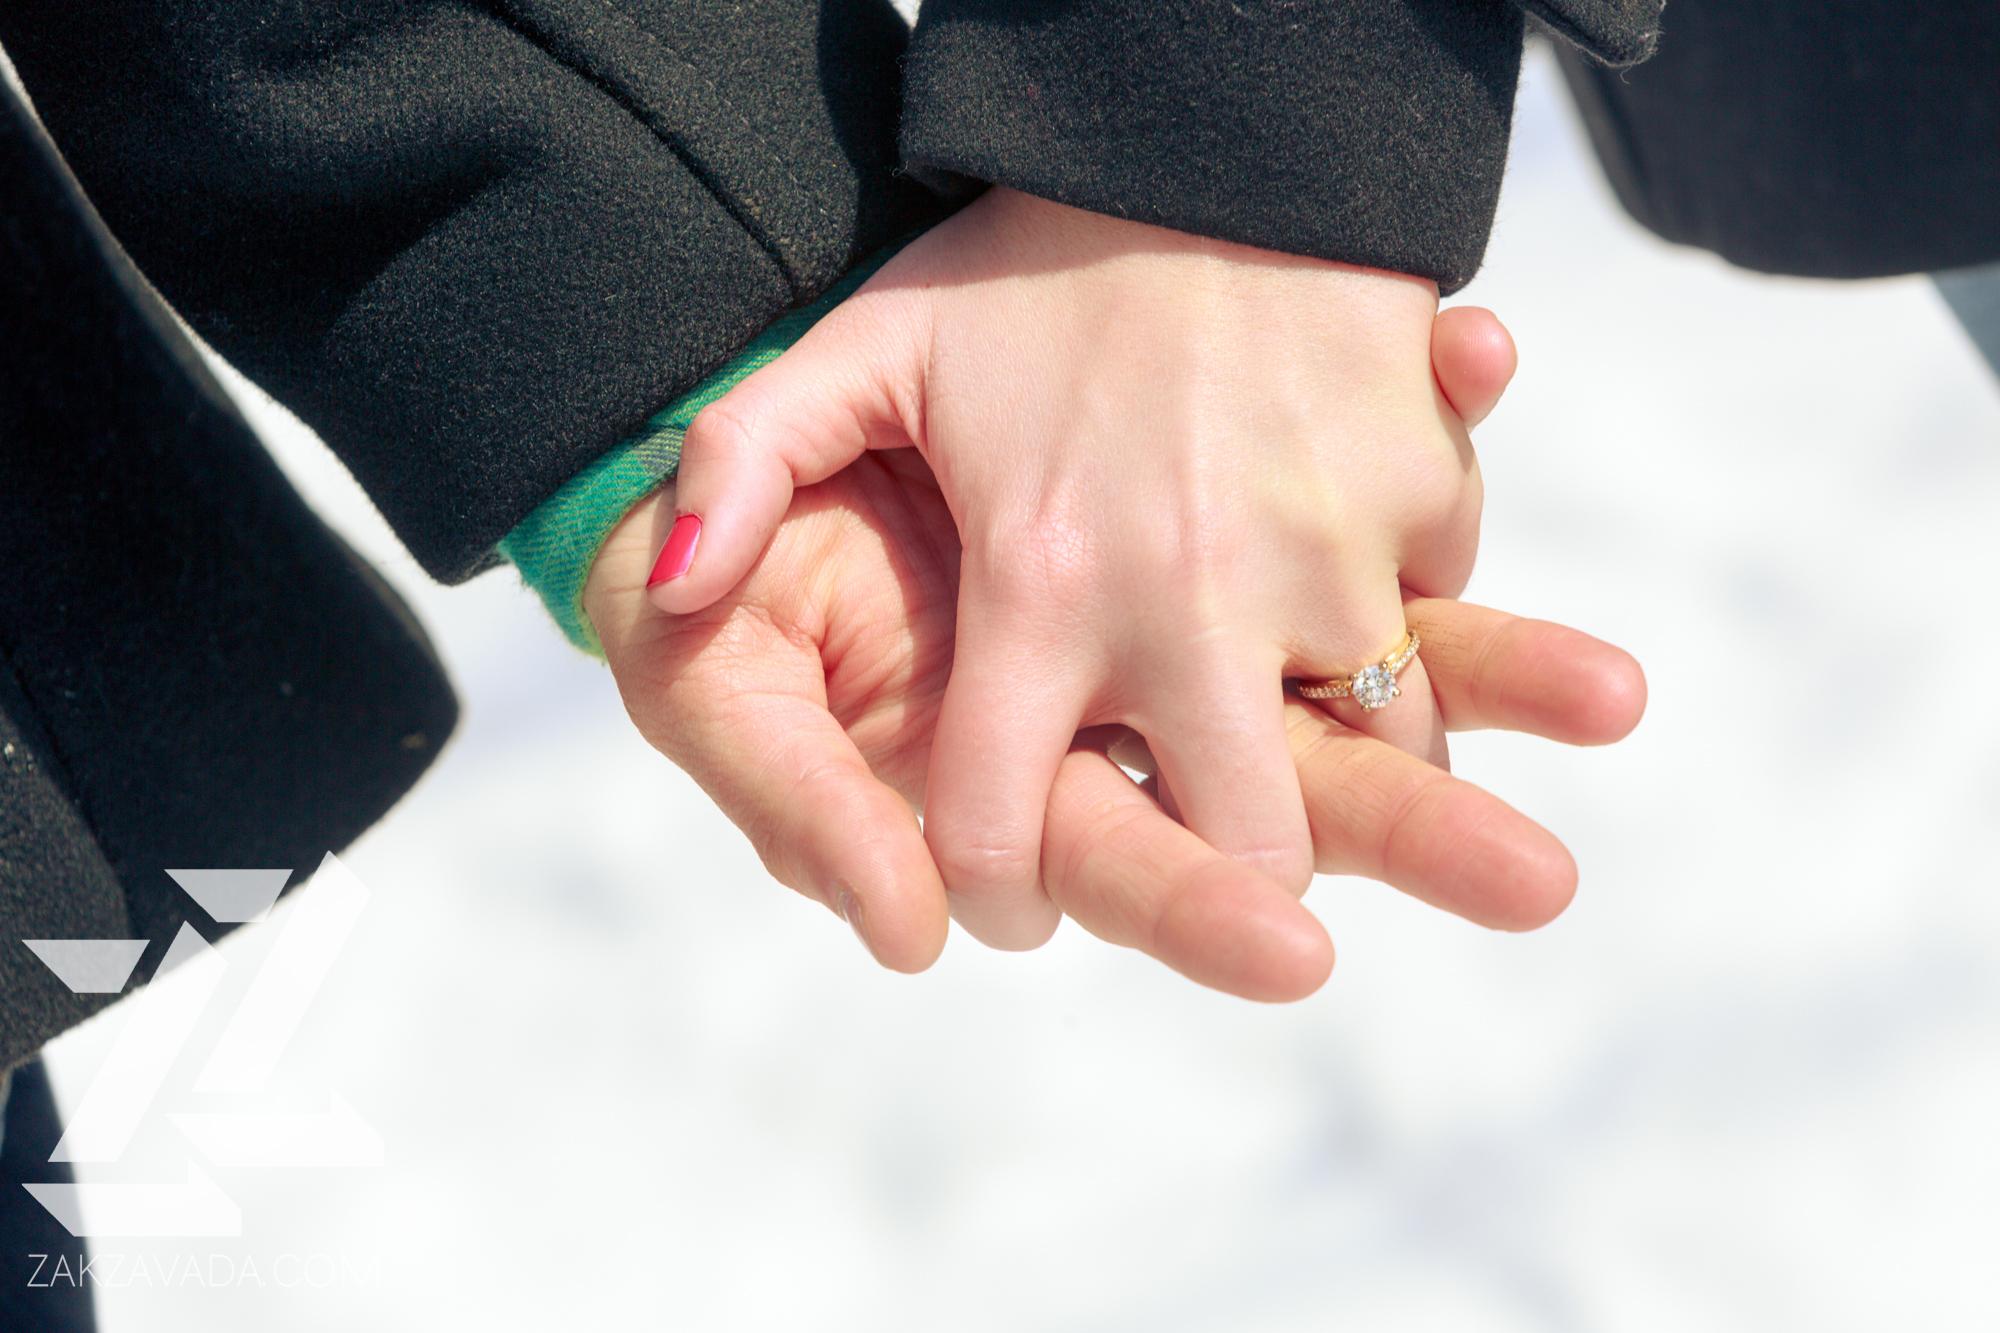 scranton-wedding-photography-zak-zavada-2015.03-mariDustinEngagement-2015-9.jpg